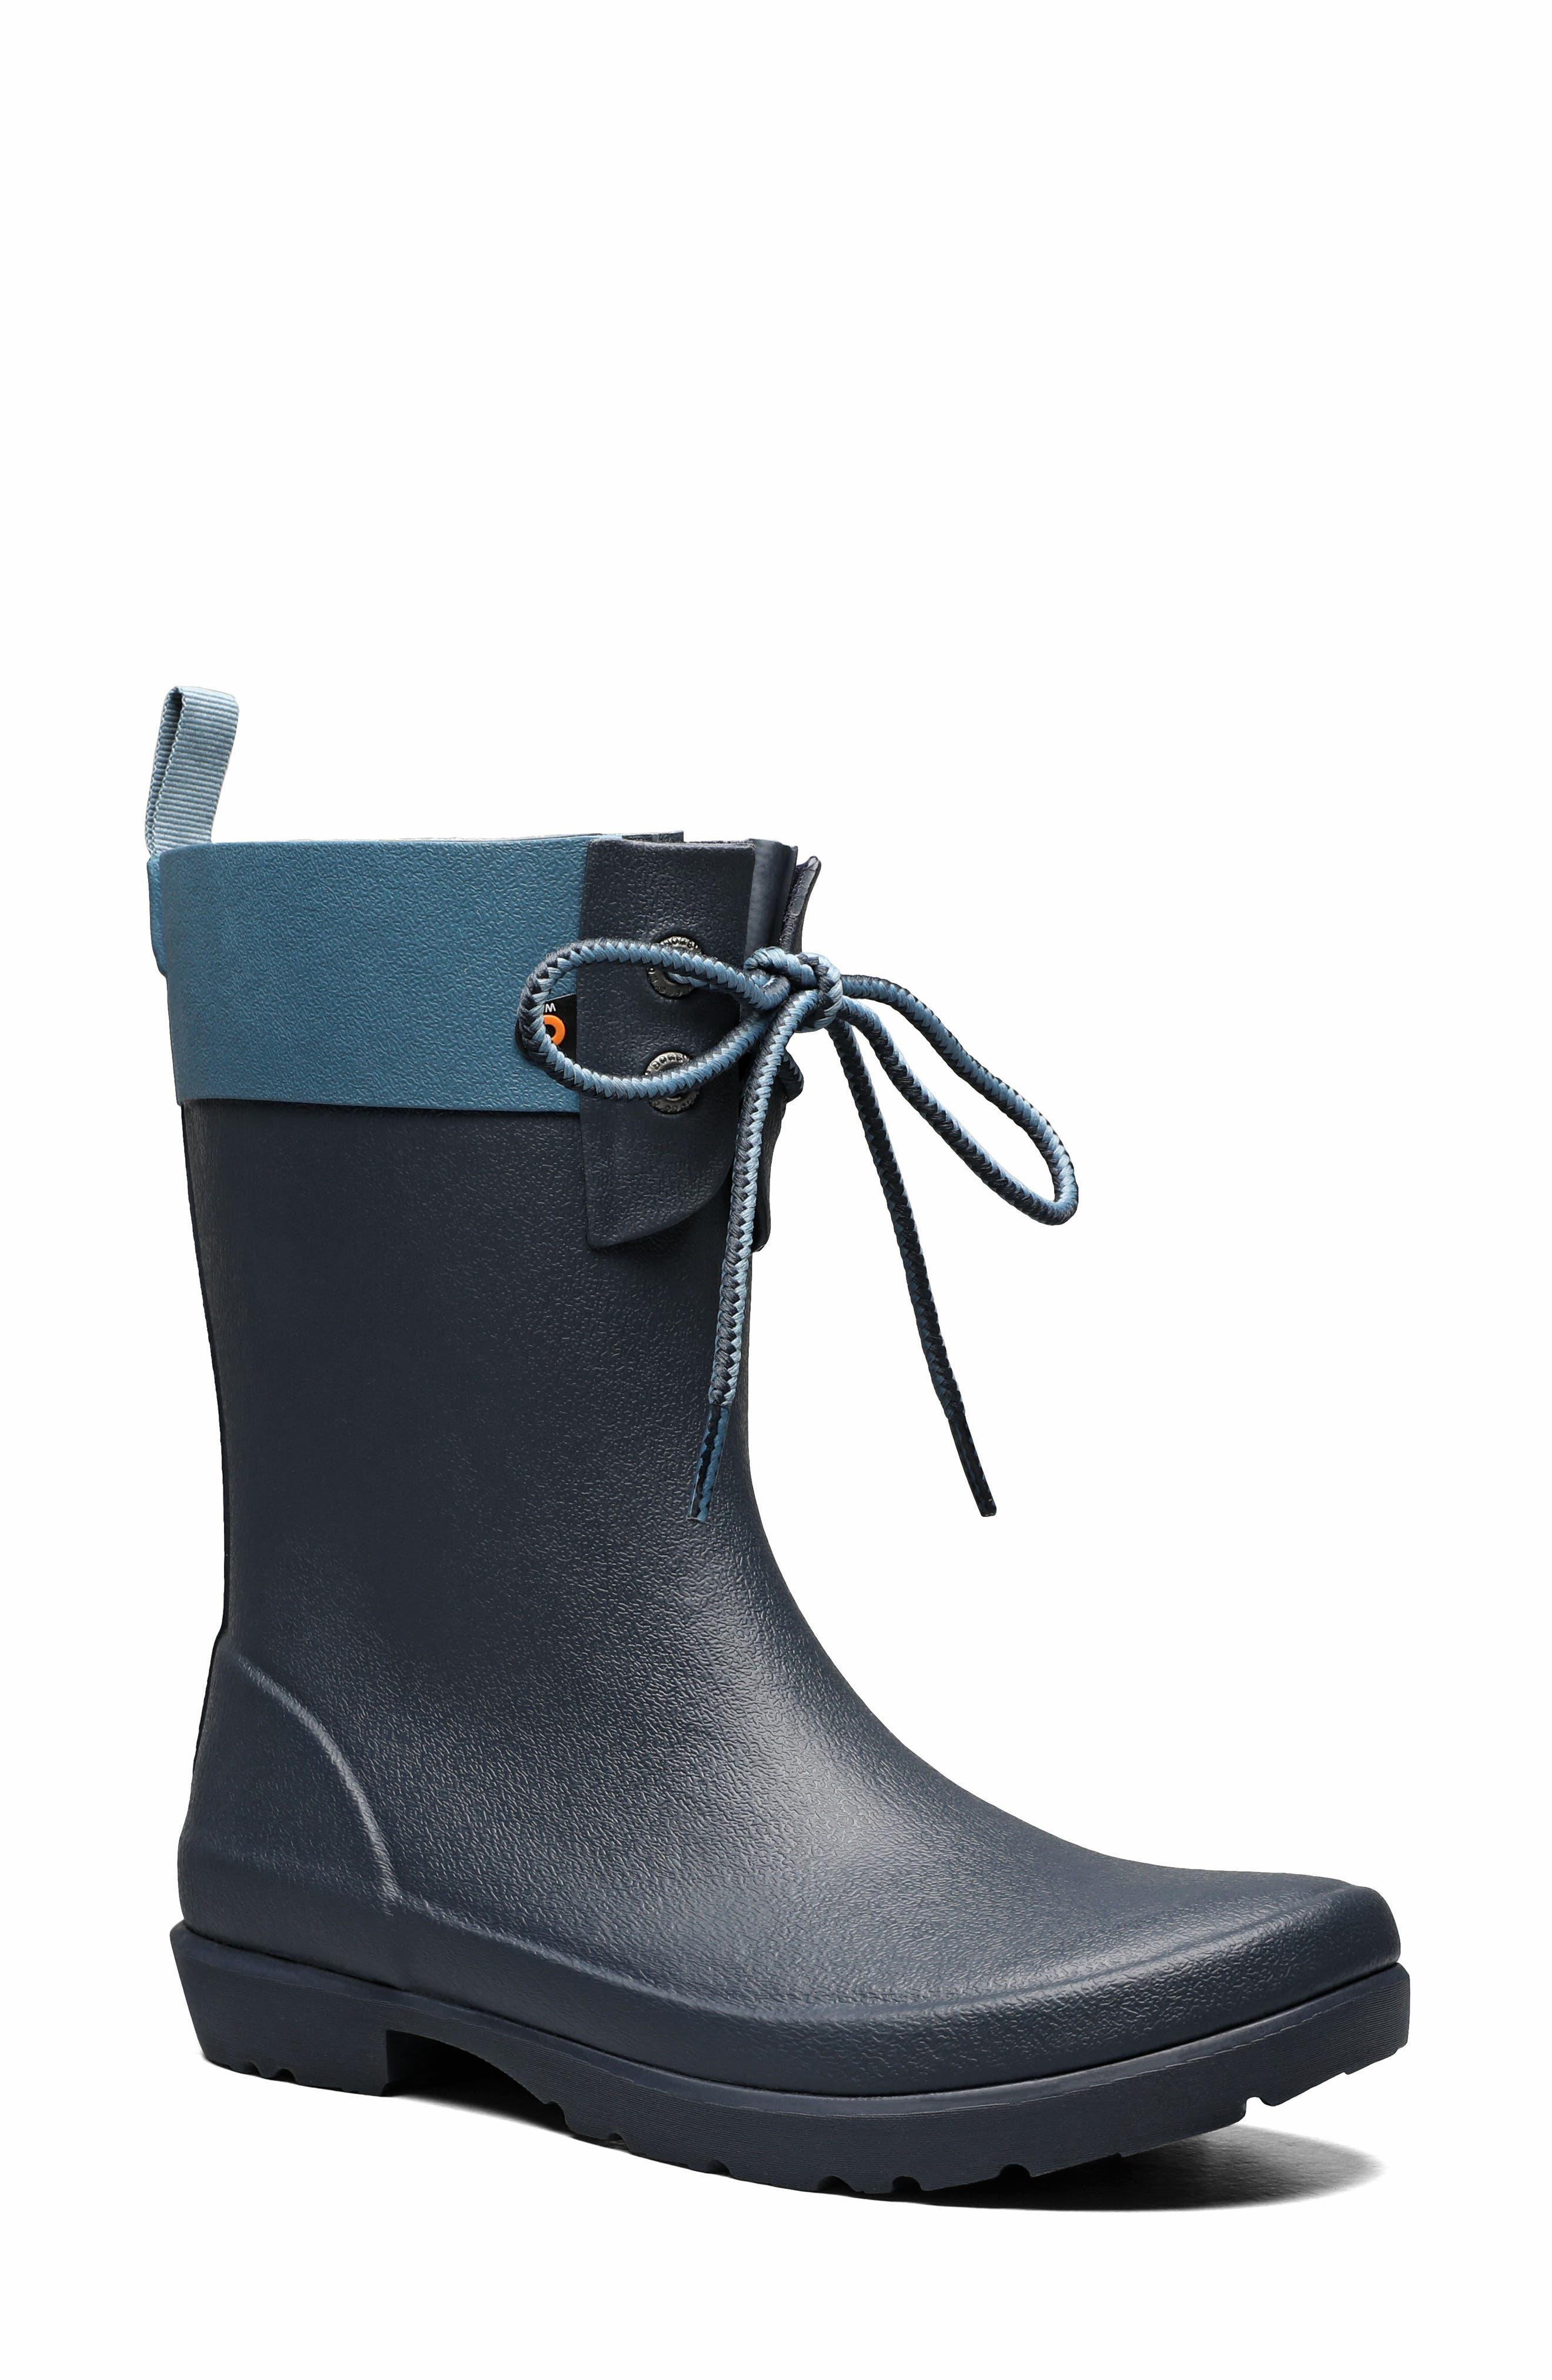 Flora Lace Top Waterproof Rain Boot